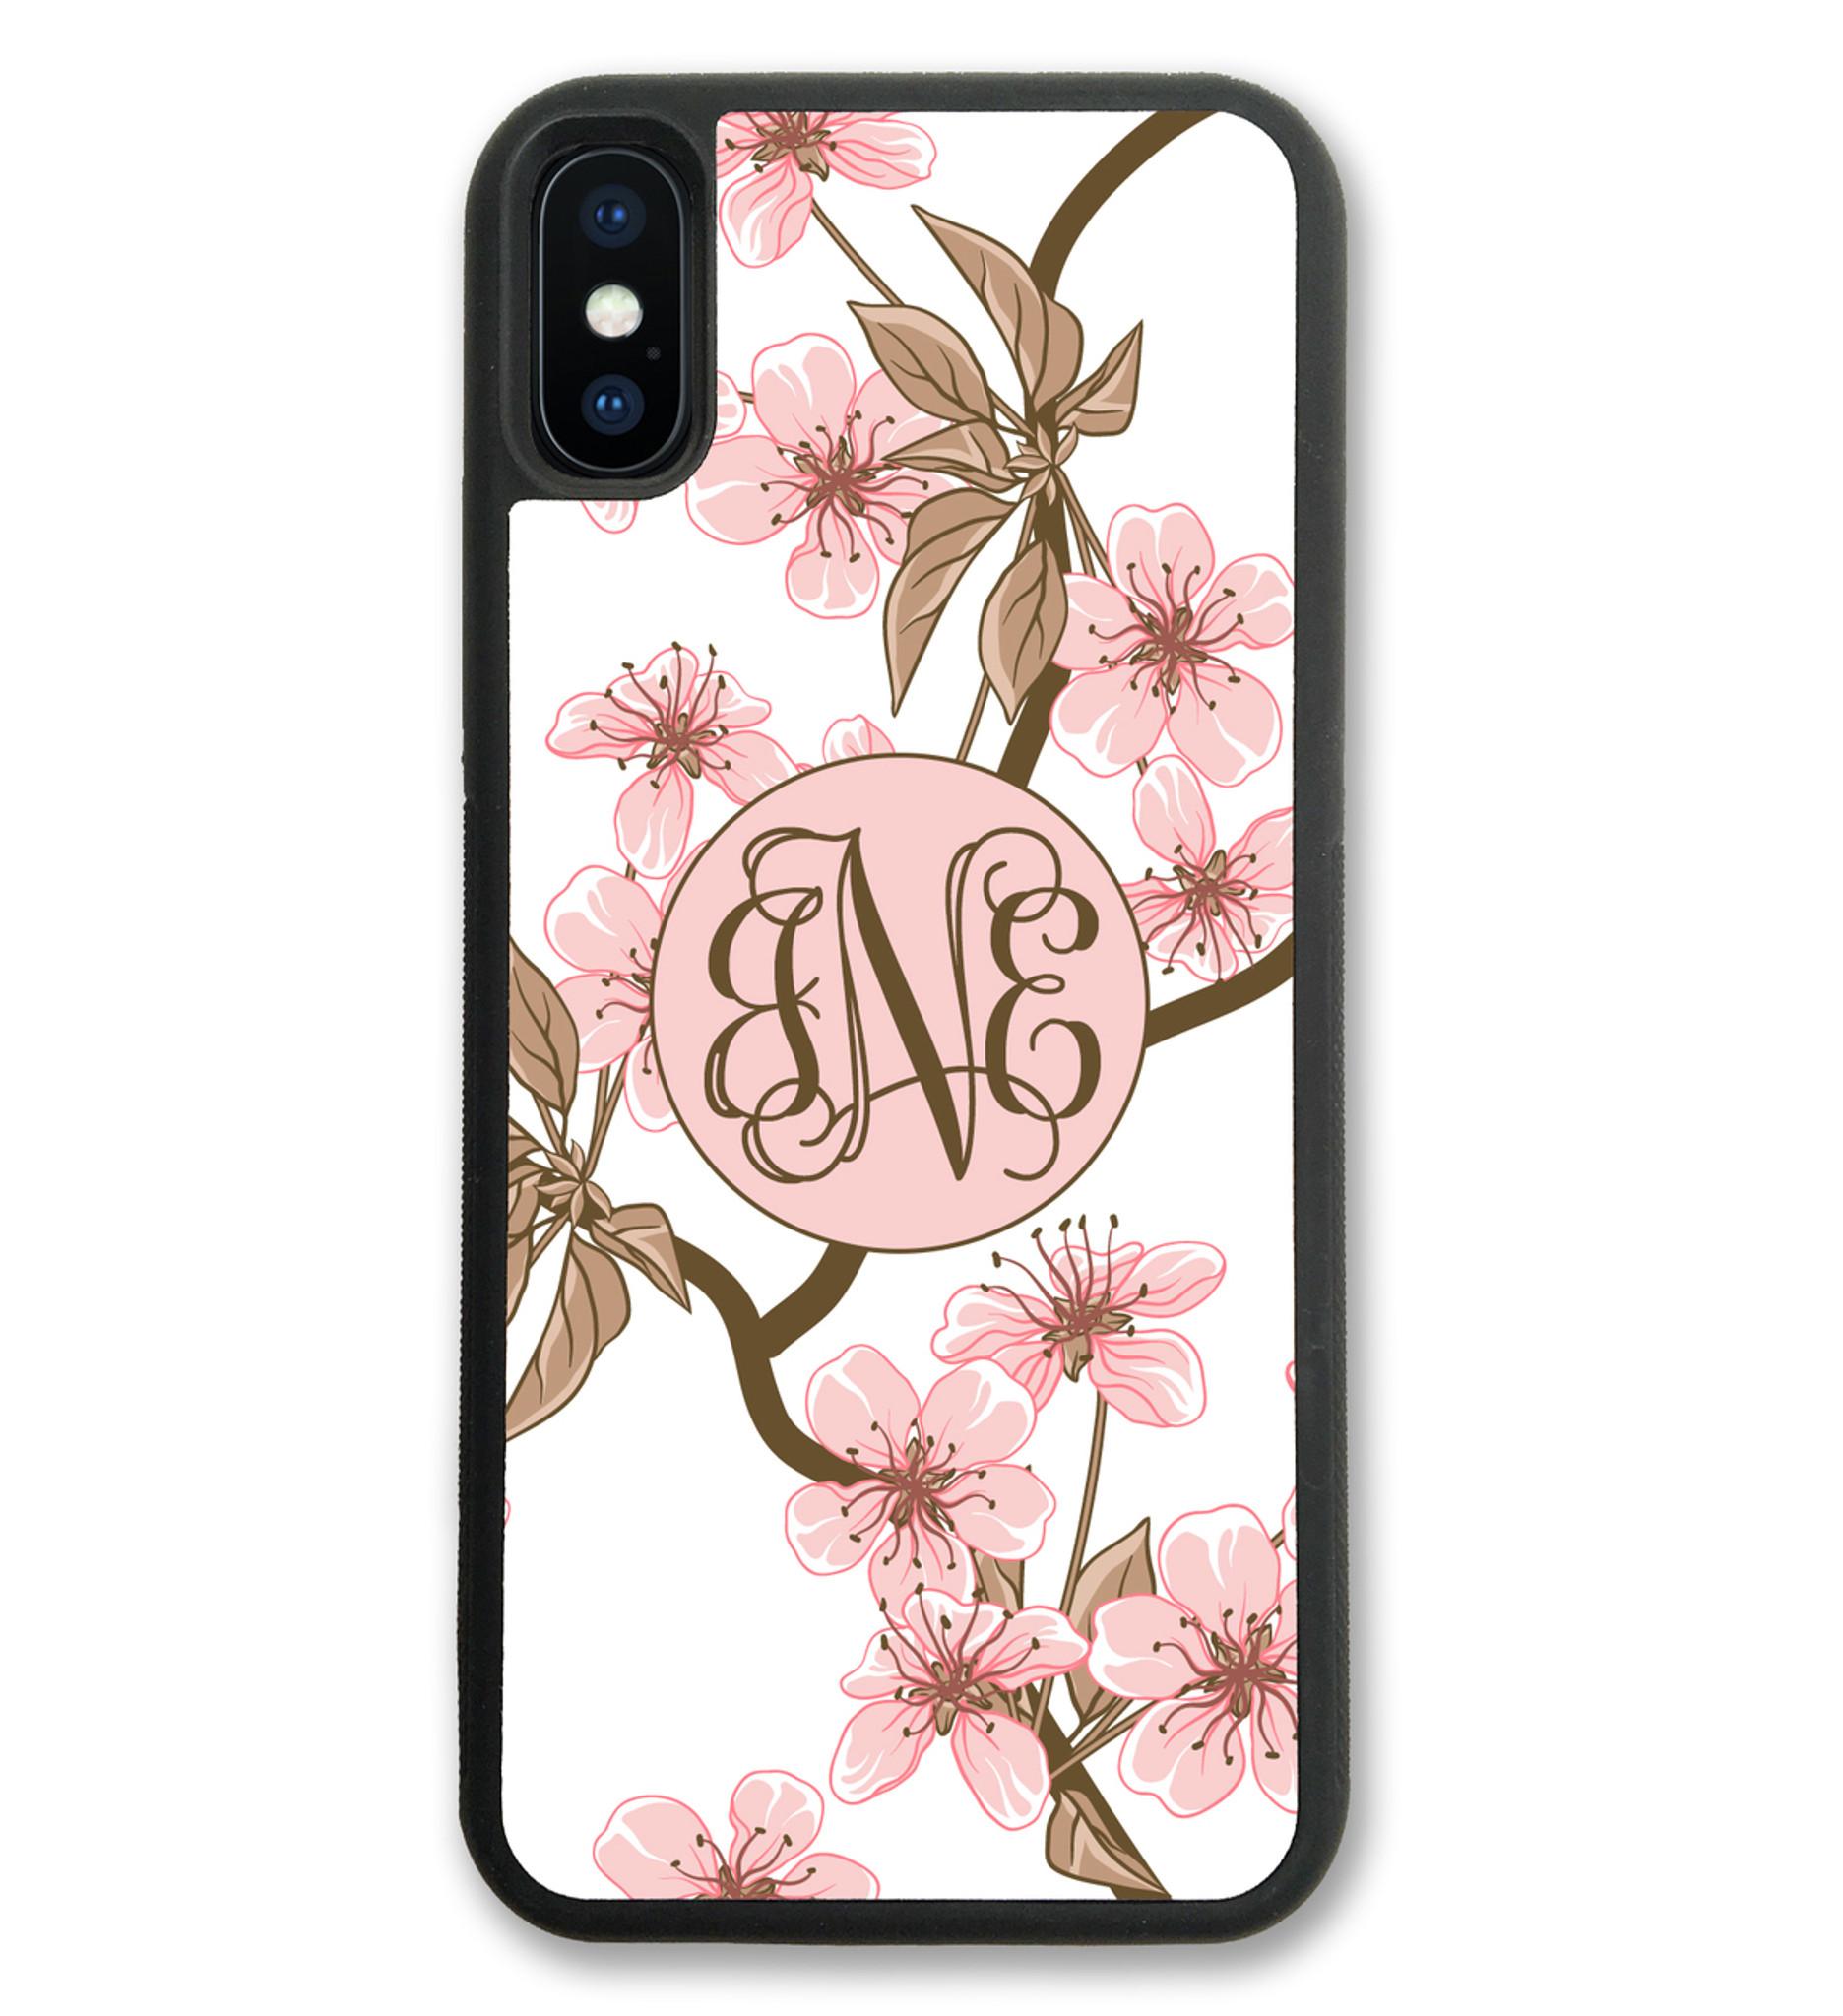 online retailer 77326 b4ac6 Cherry Blossom iPhone X Case, iPhone 10 Case, iPhone 8 Case, iPhone 8 Plus  Case, All Models